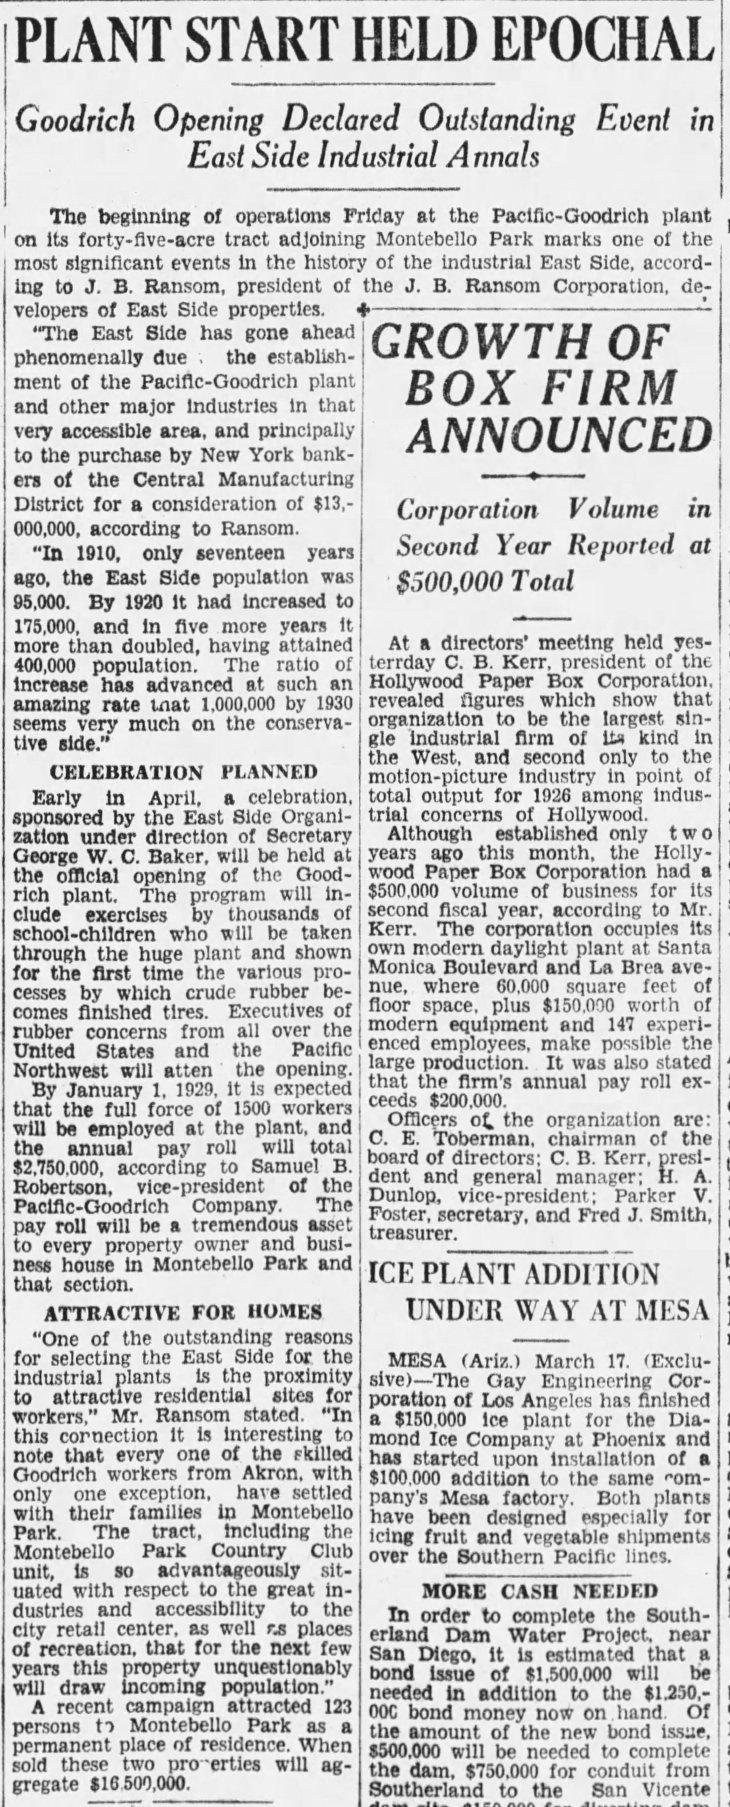 Good rich plant epochal The_Los_Angeles_Times_Sun__Mar_18__1928_